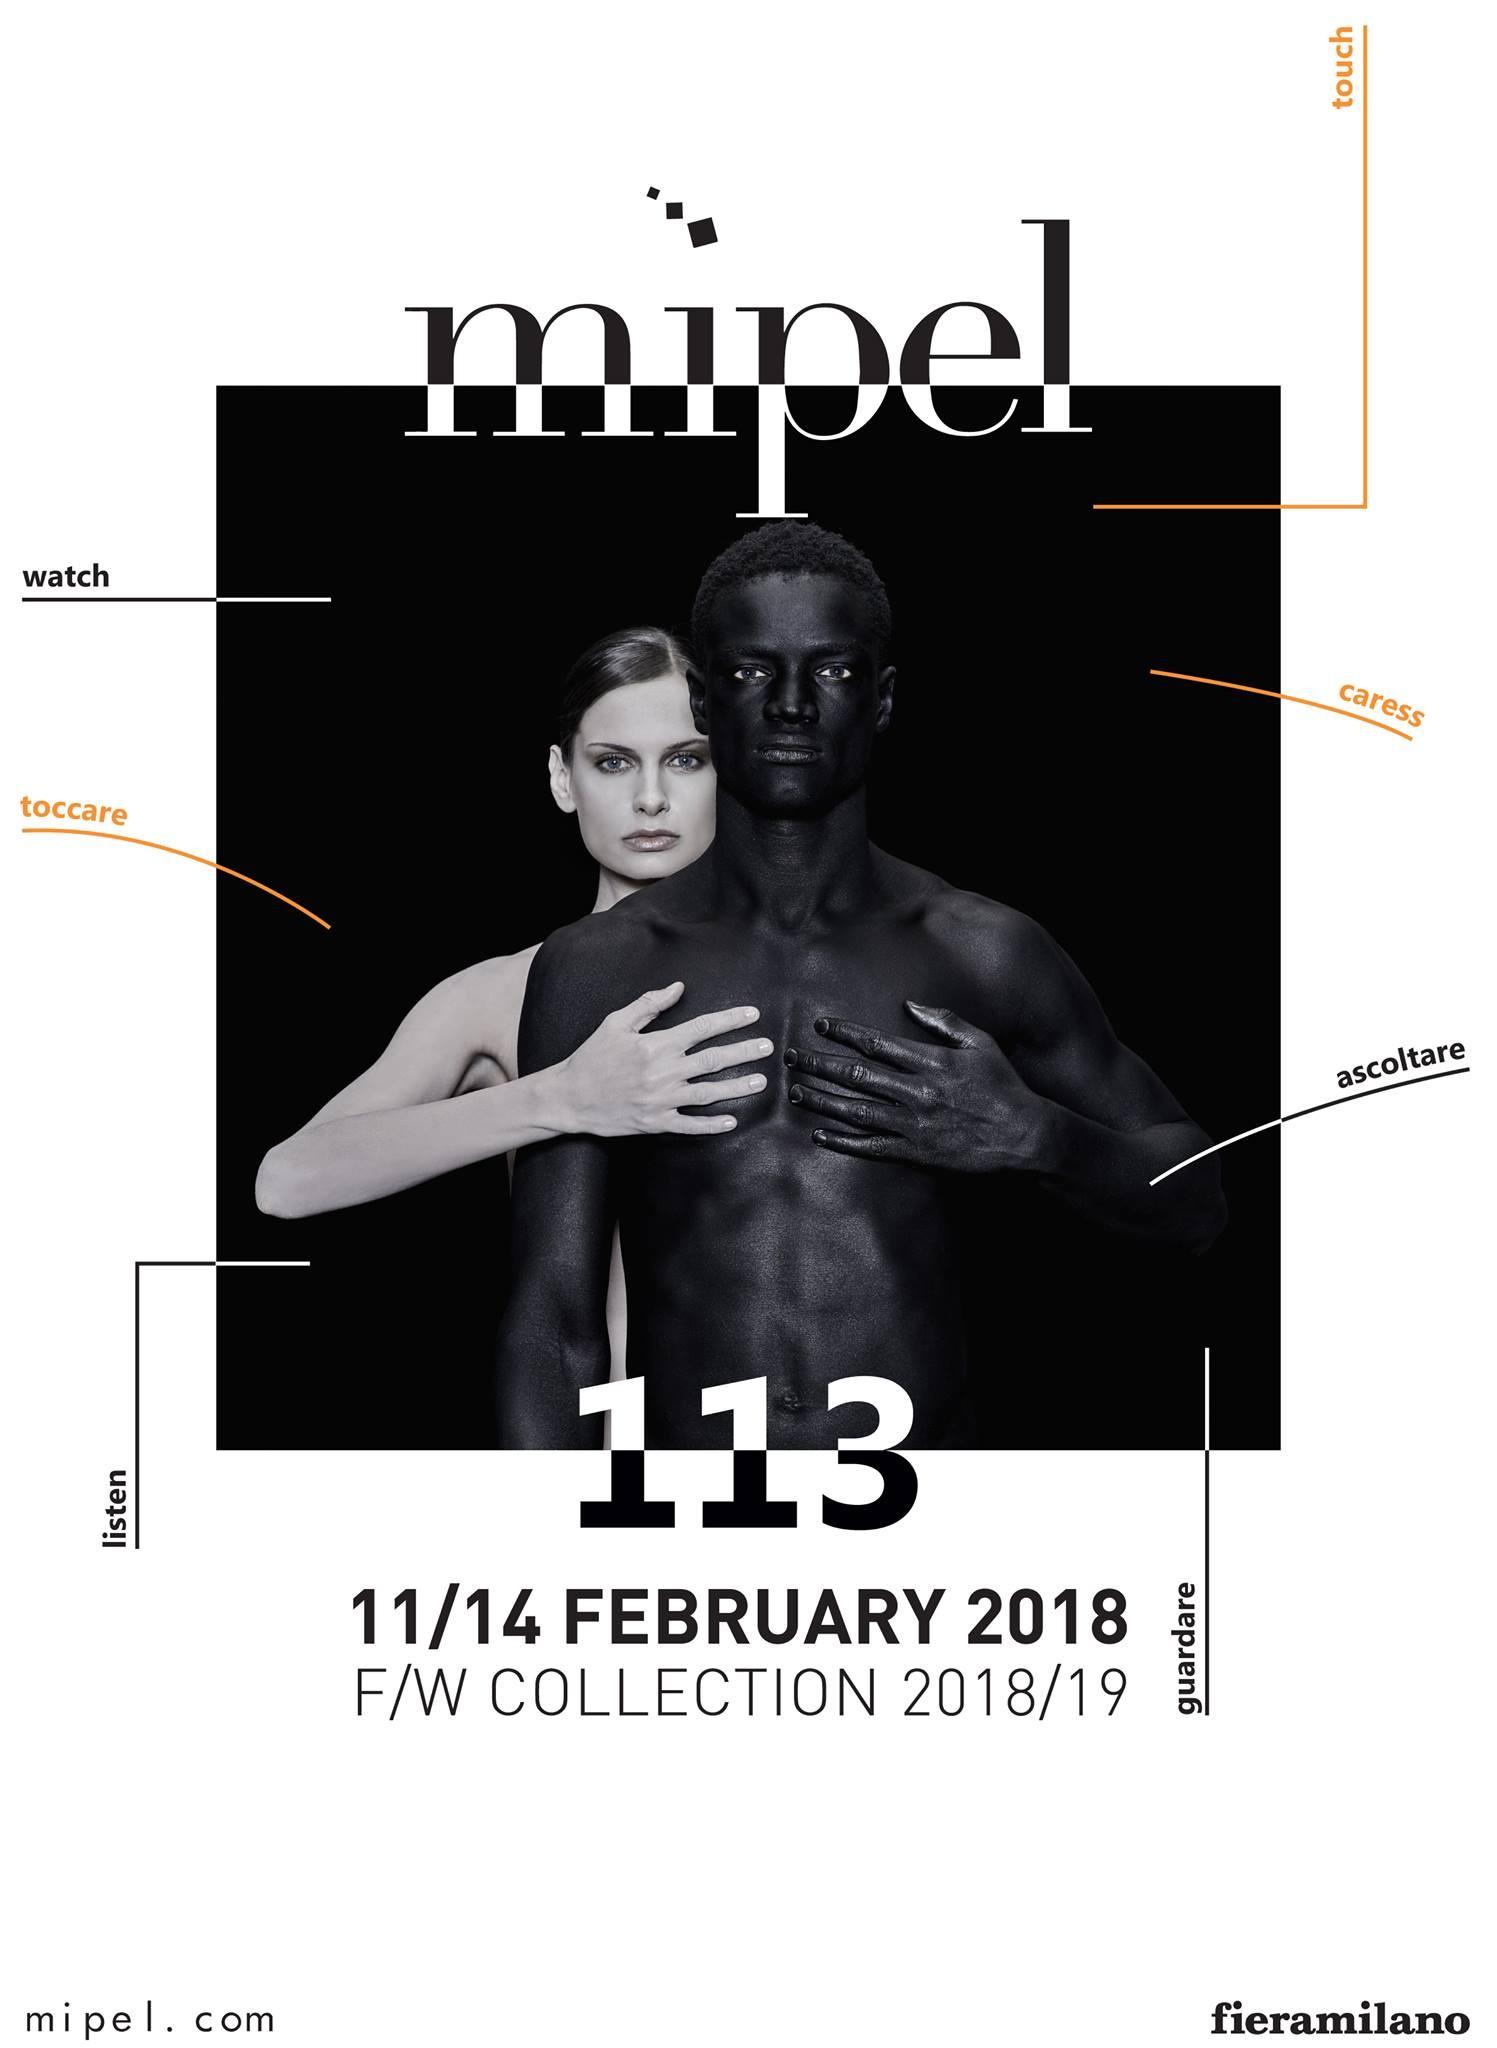 Mokamusic at Mipel for a multi-sensorial project